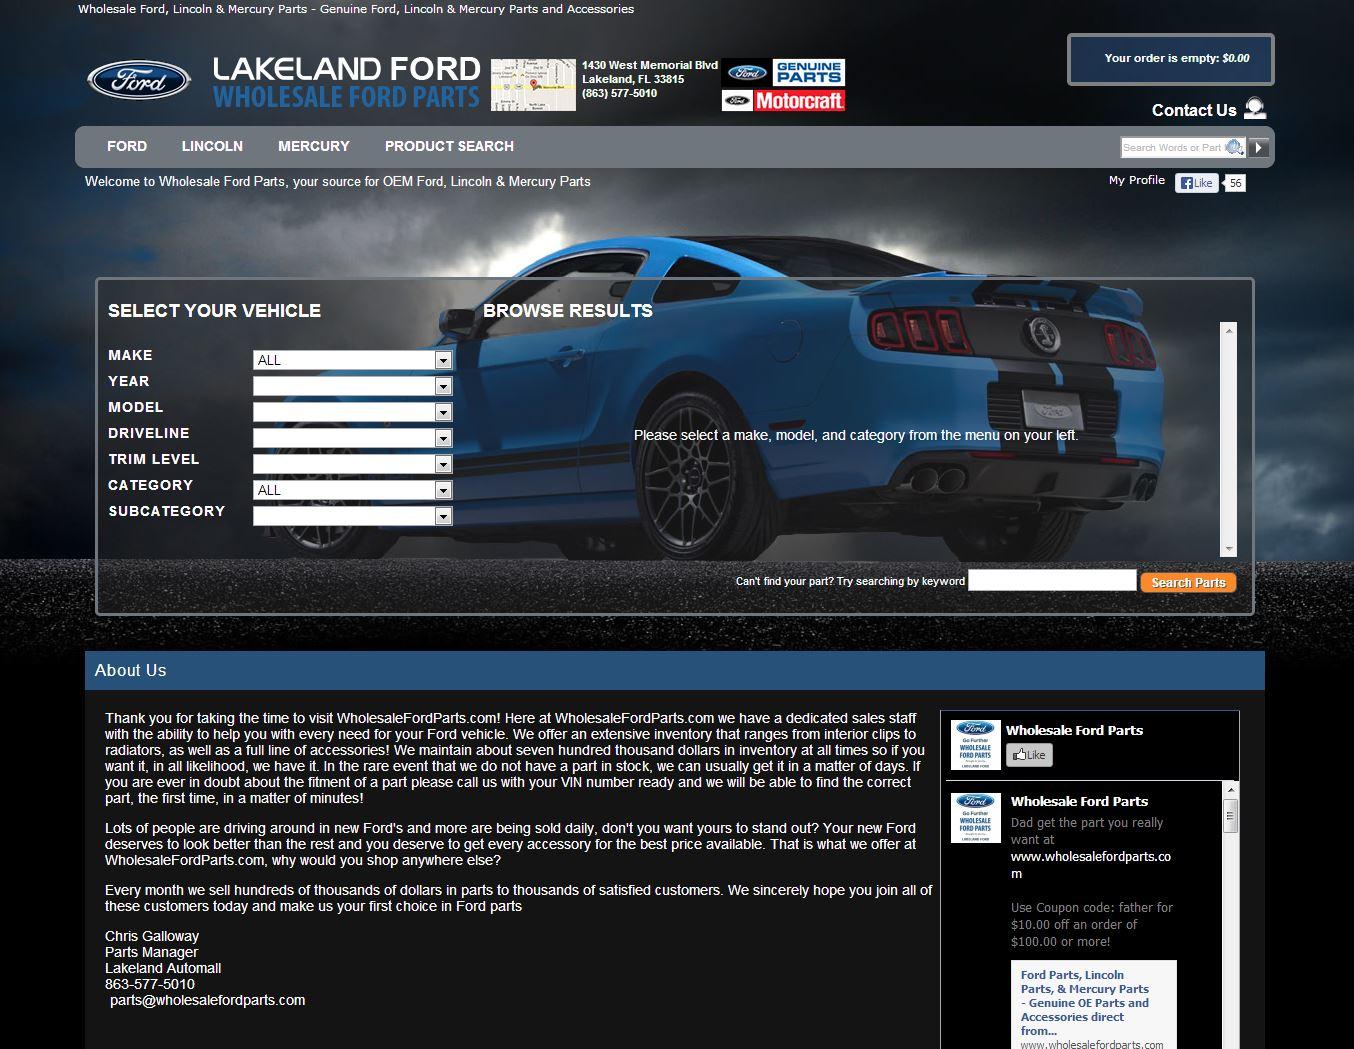 Lakeland Ford P